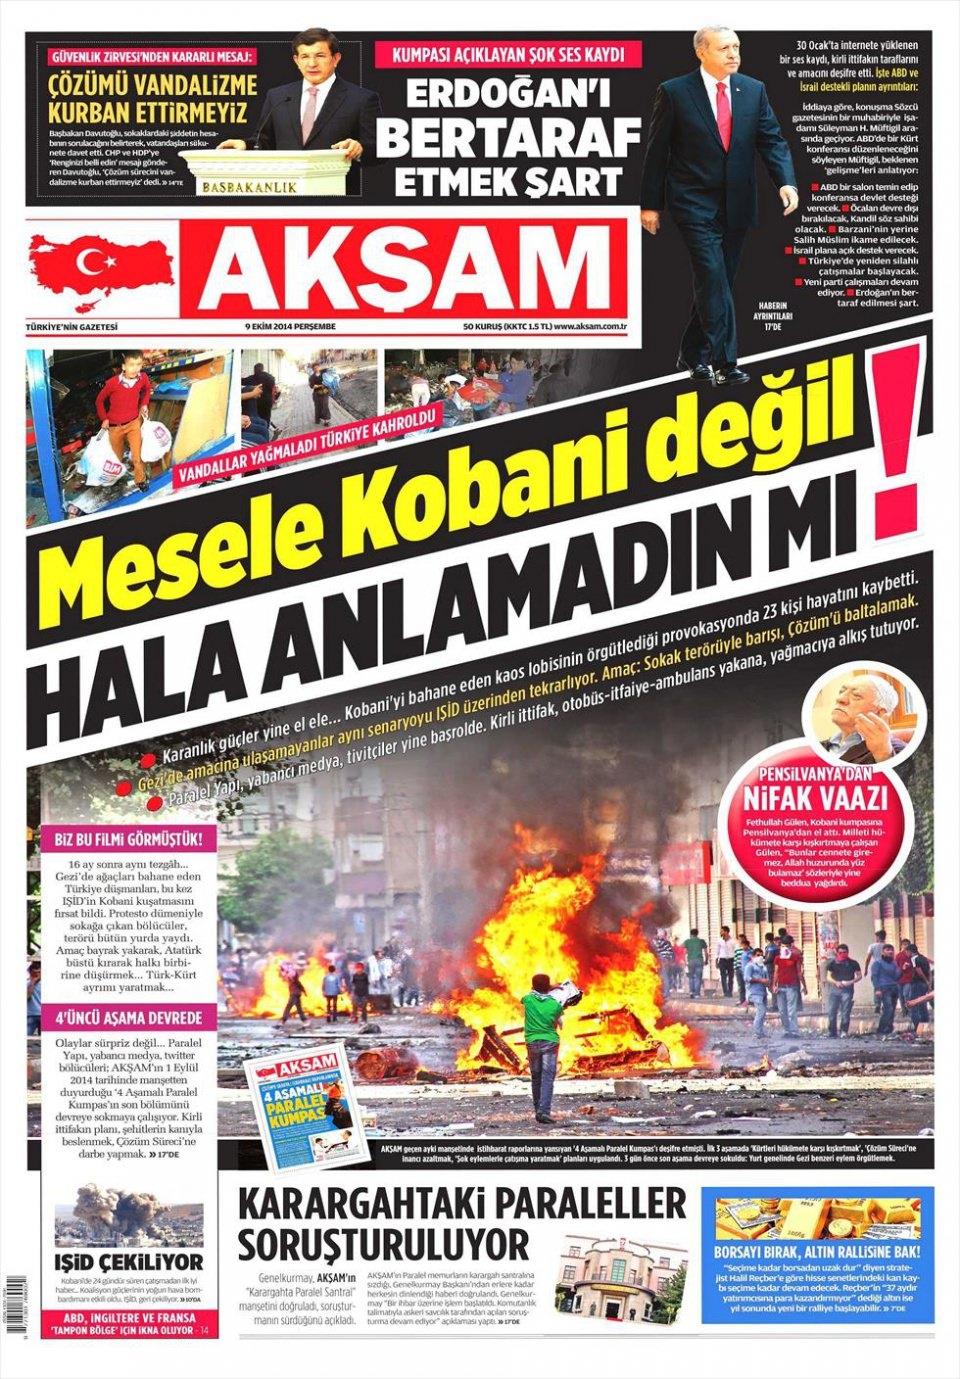 9 Ekim Gazete Manşetleri 1